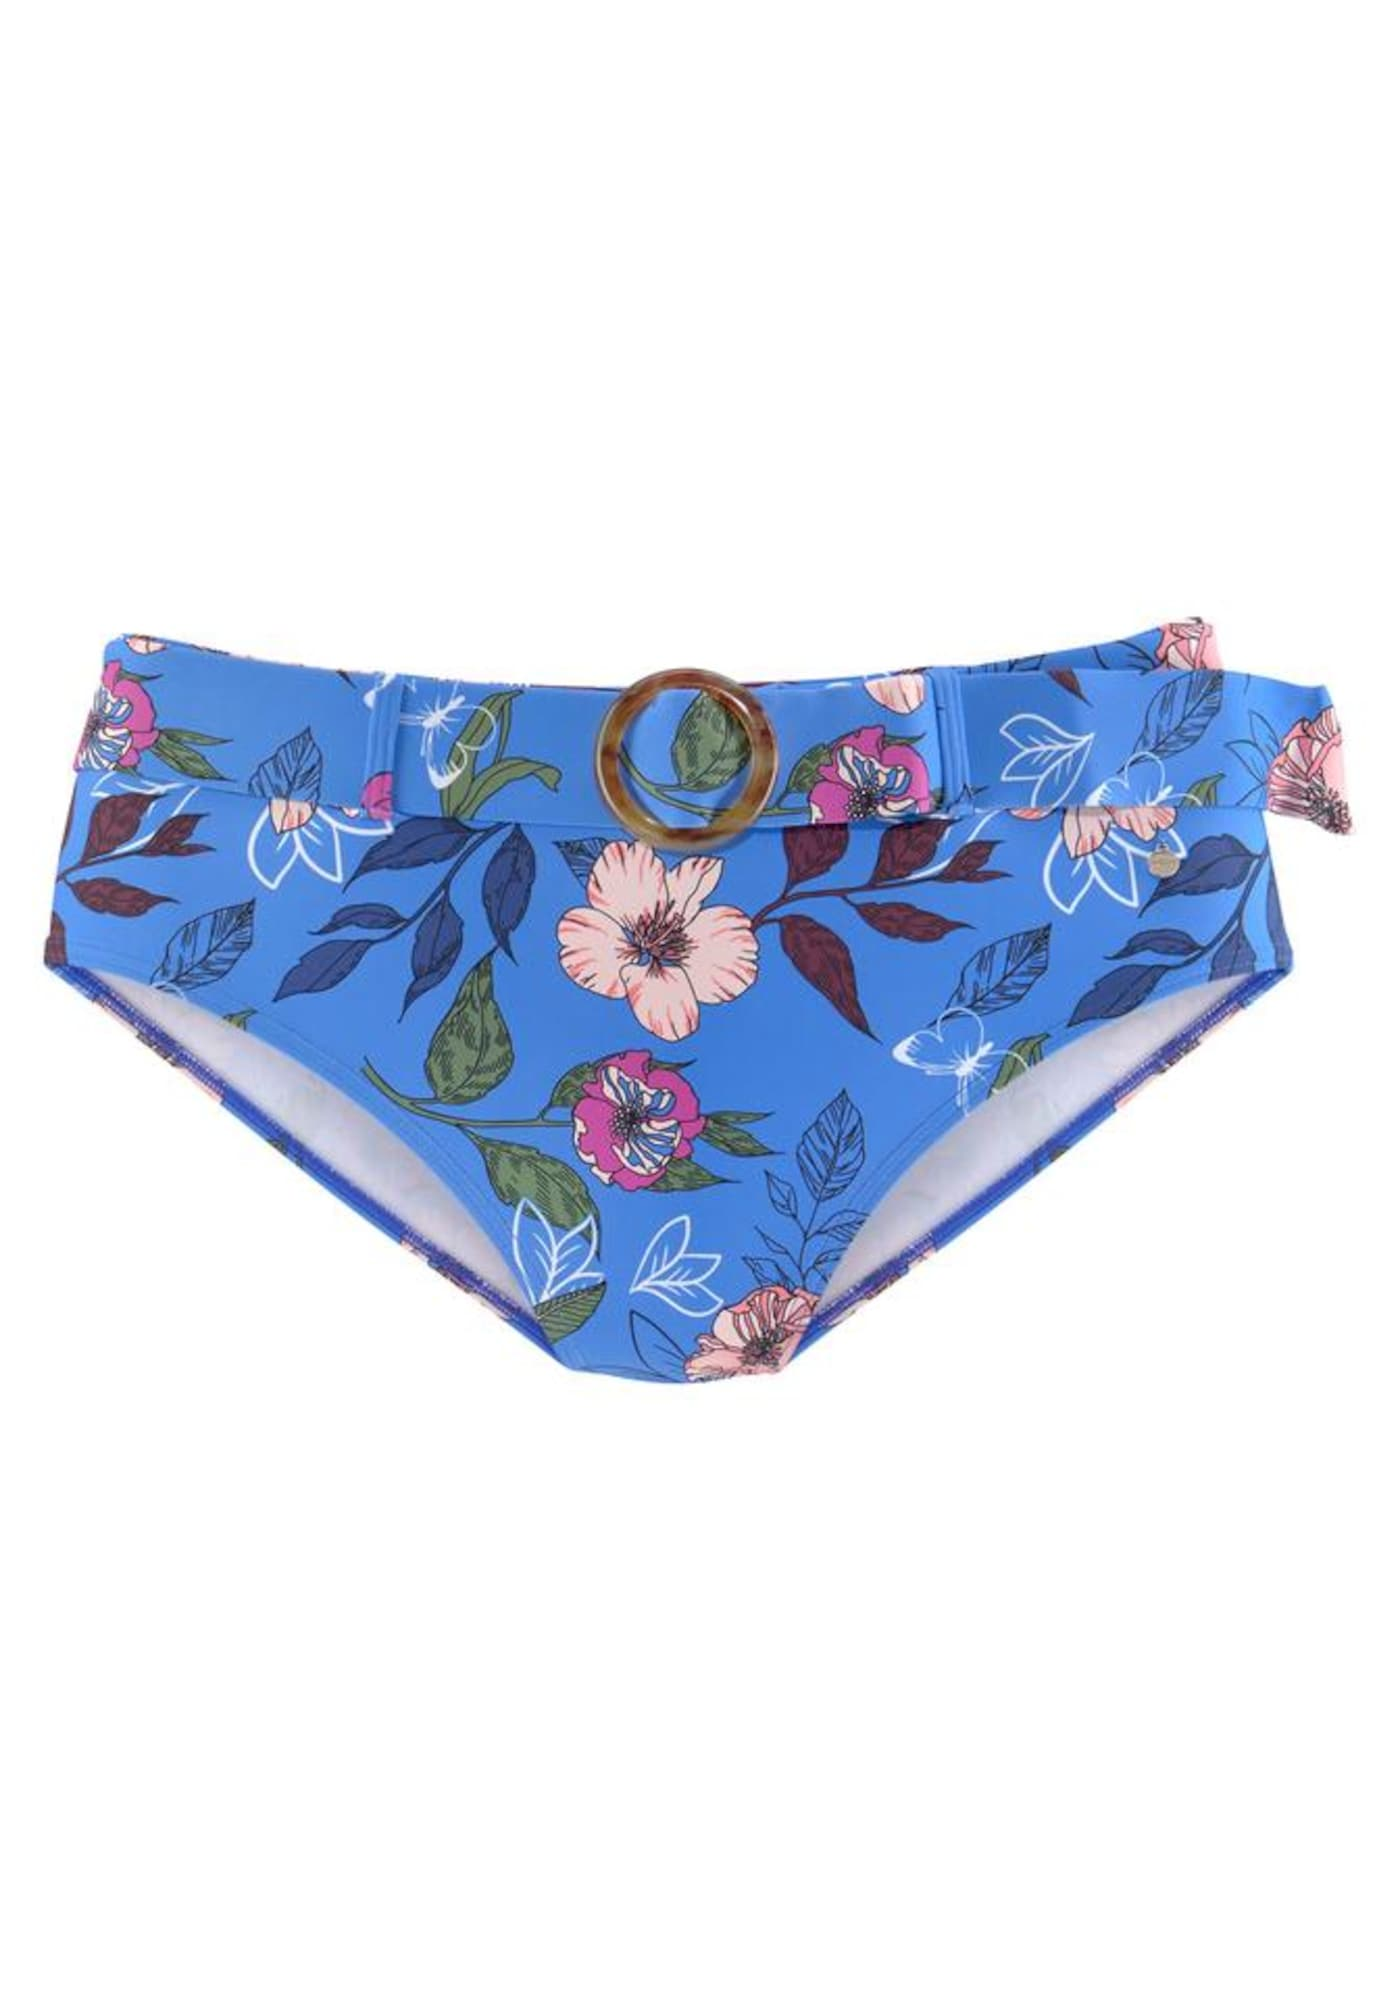 s.Oliver Bikinio kelnaitės mėlyna / mišrios spalvos